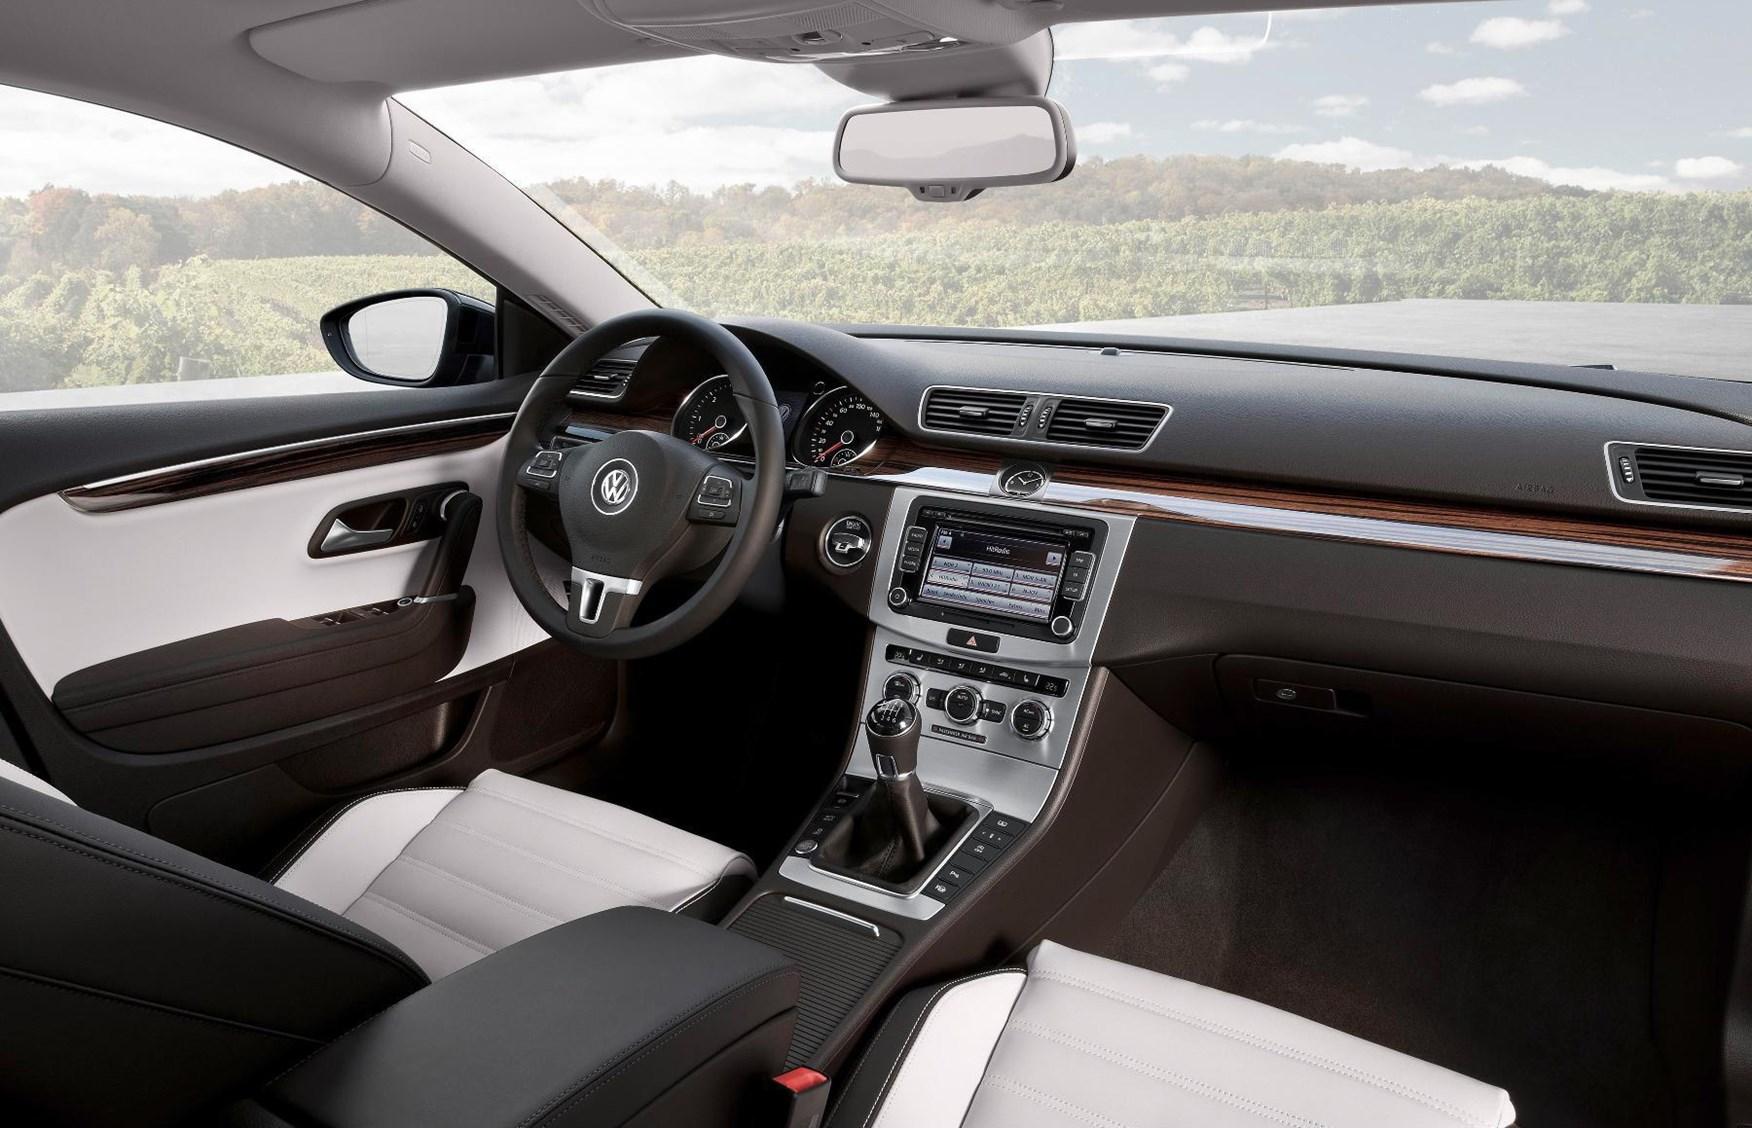 Volkswagen Cc Saloon Review 2012 2016 Parkers